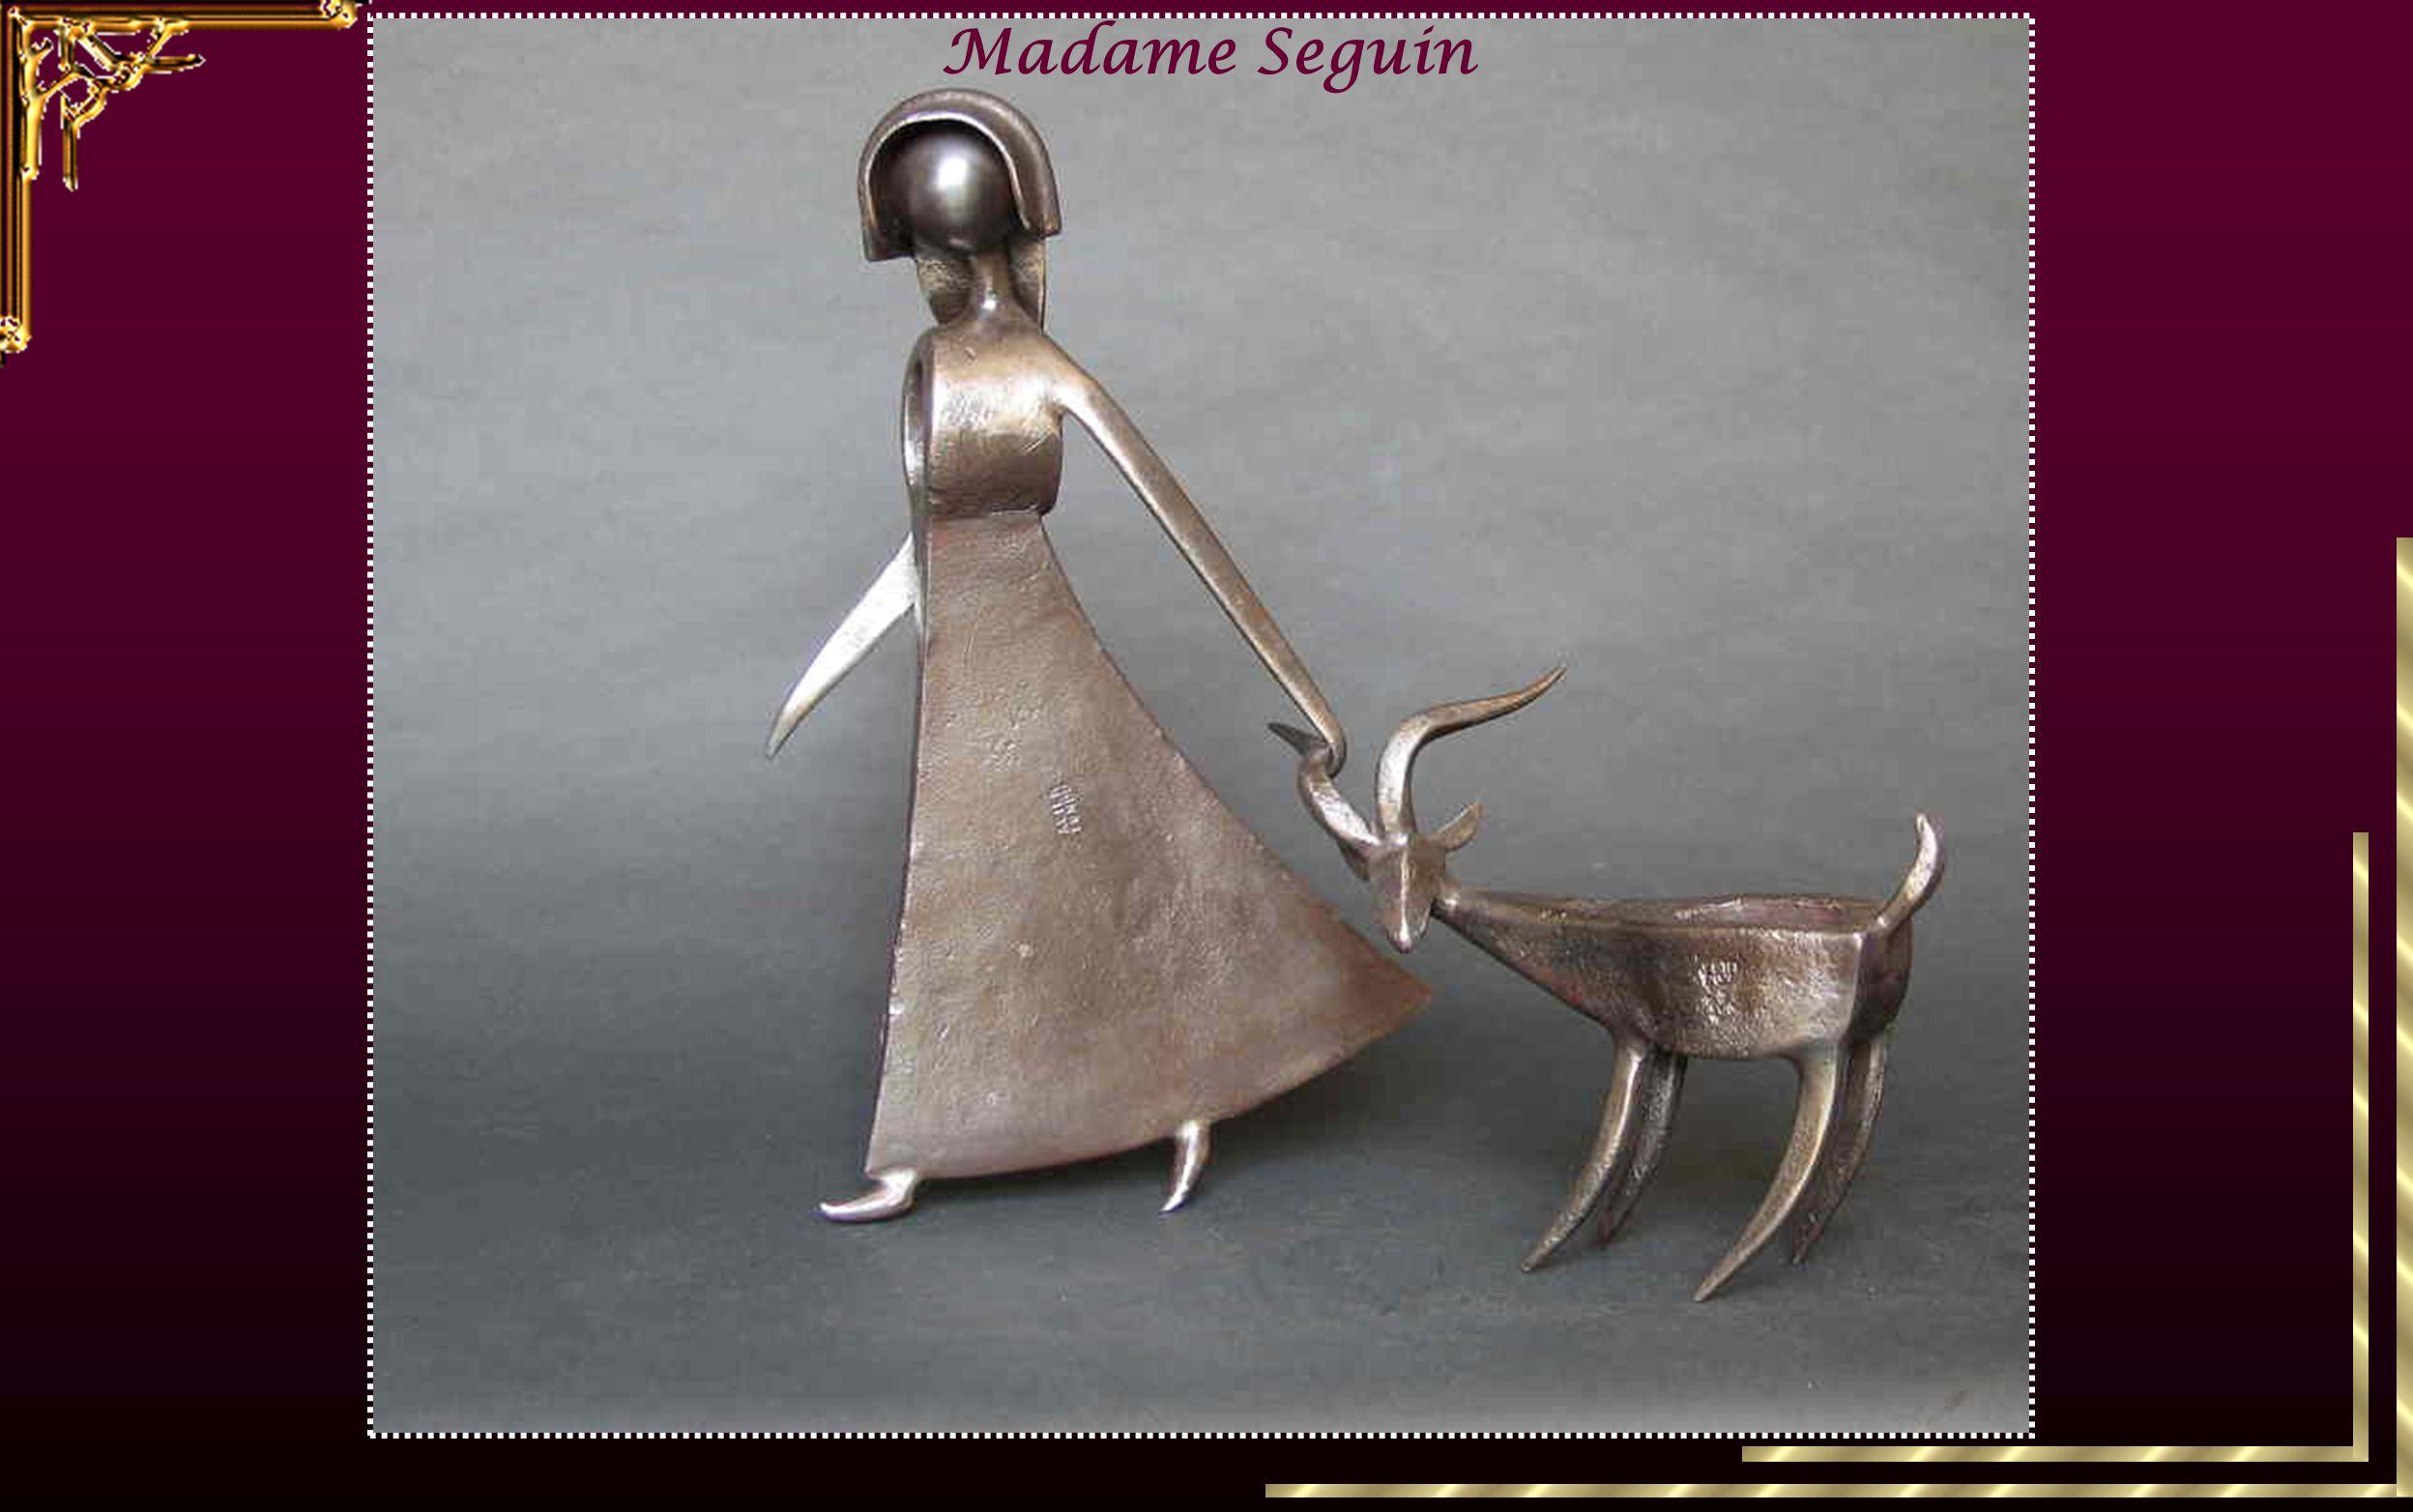 Madame Seguin